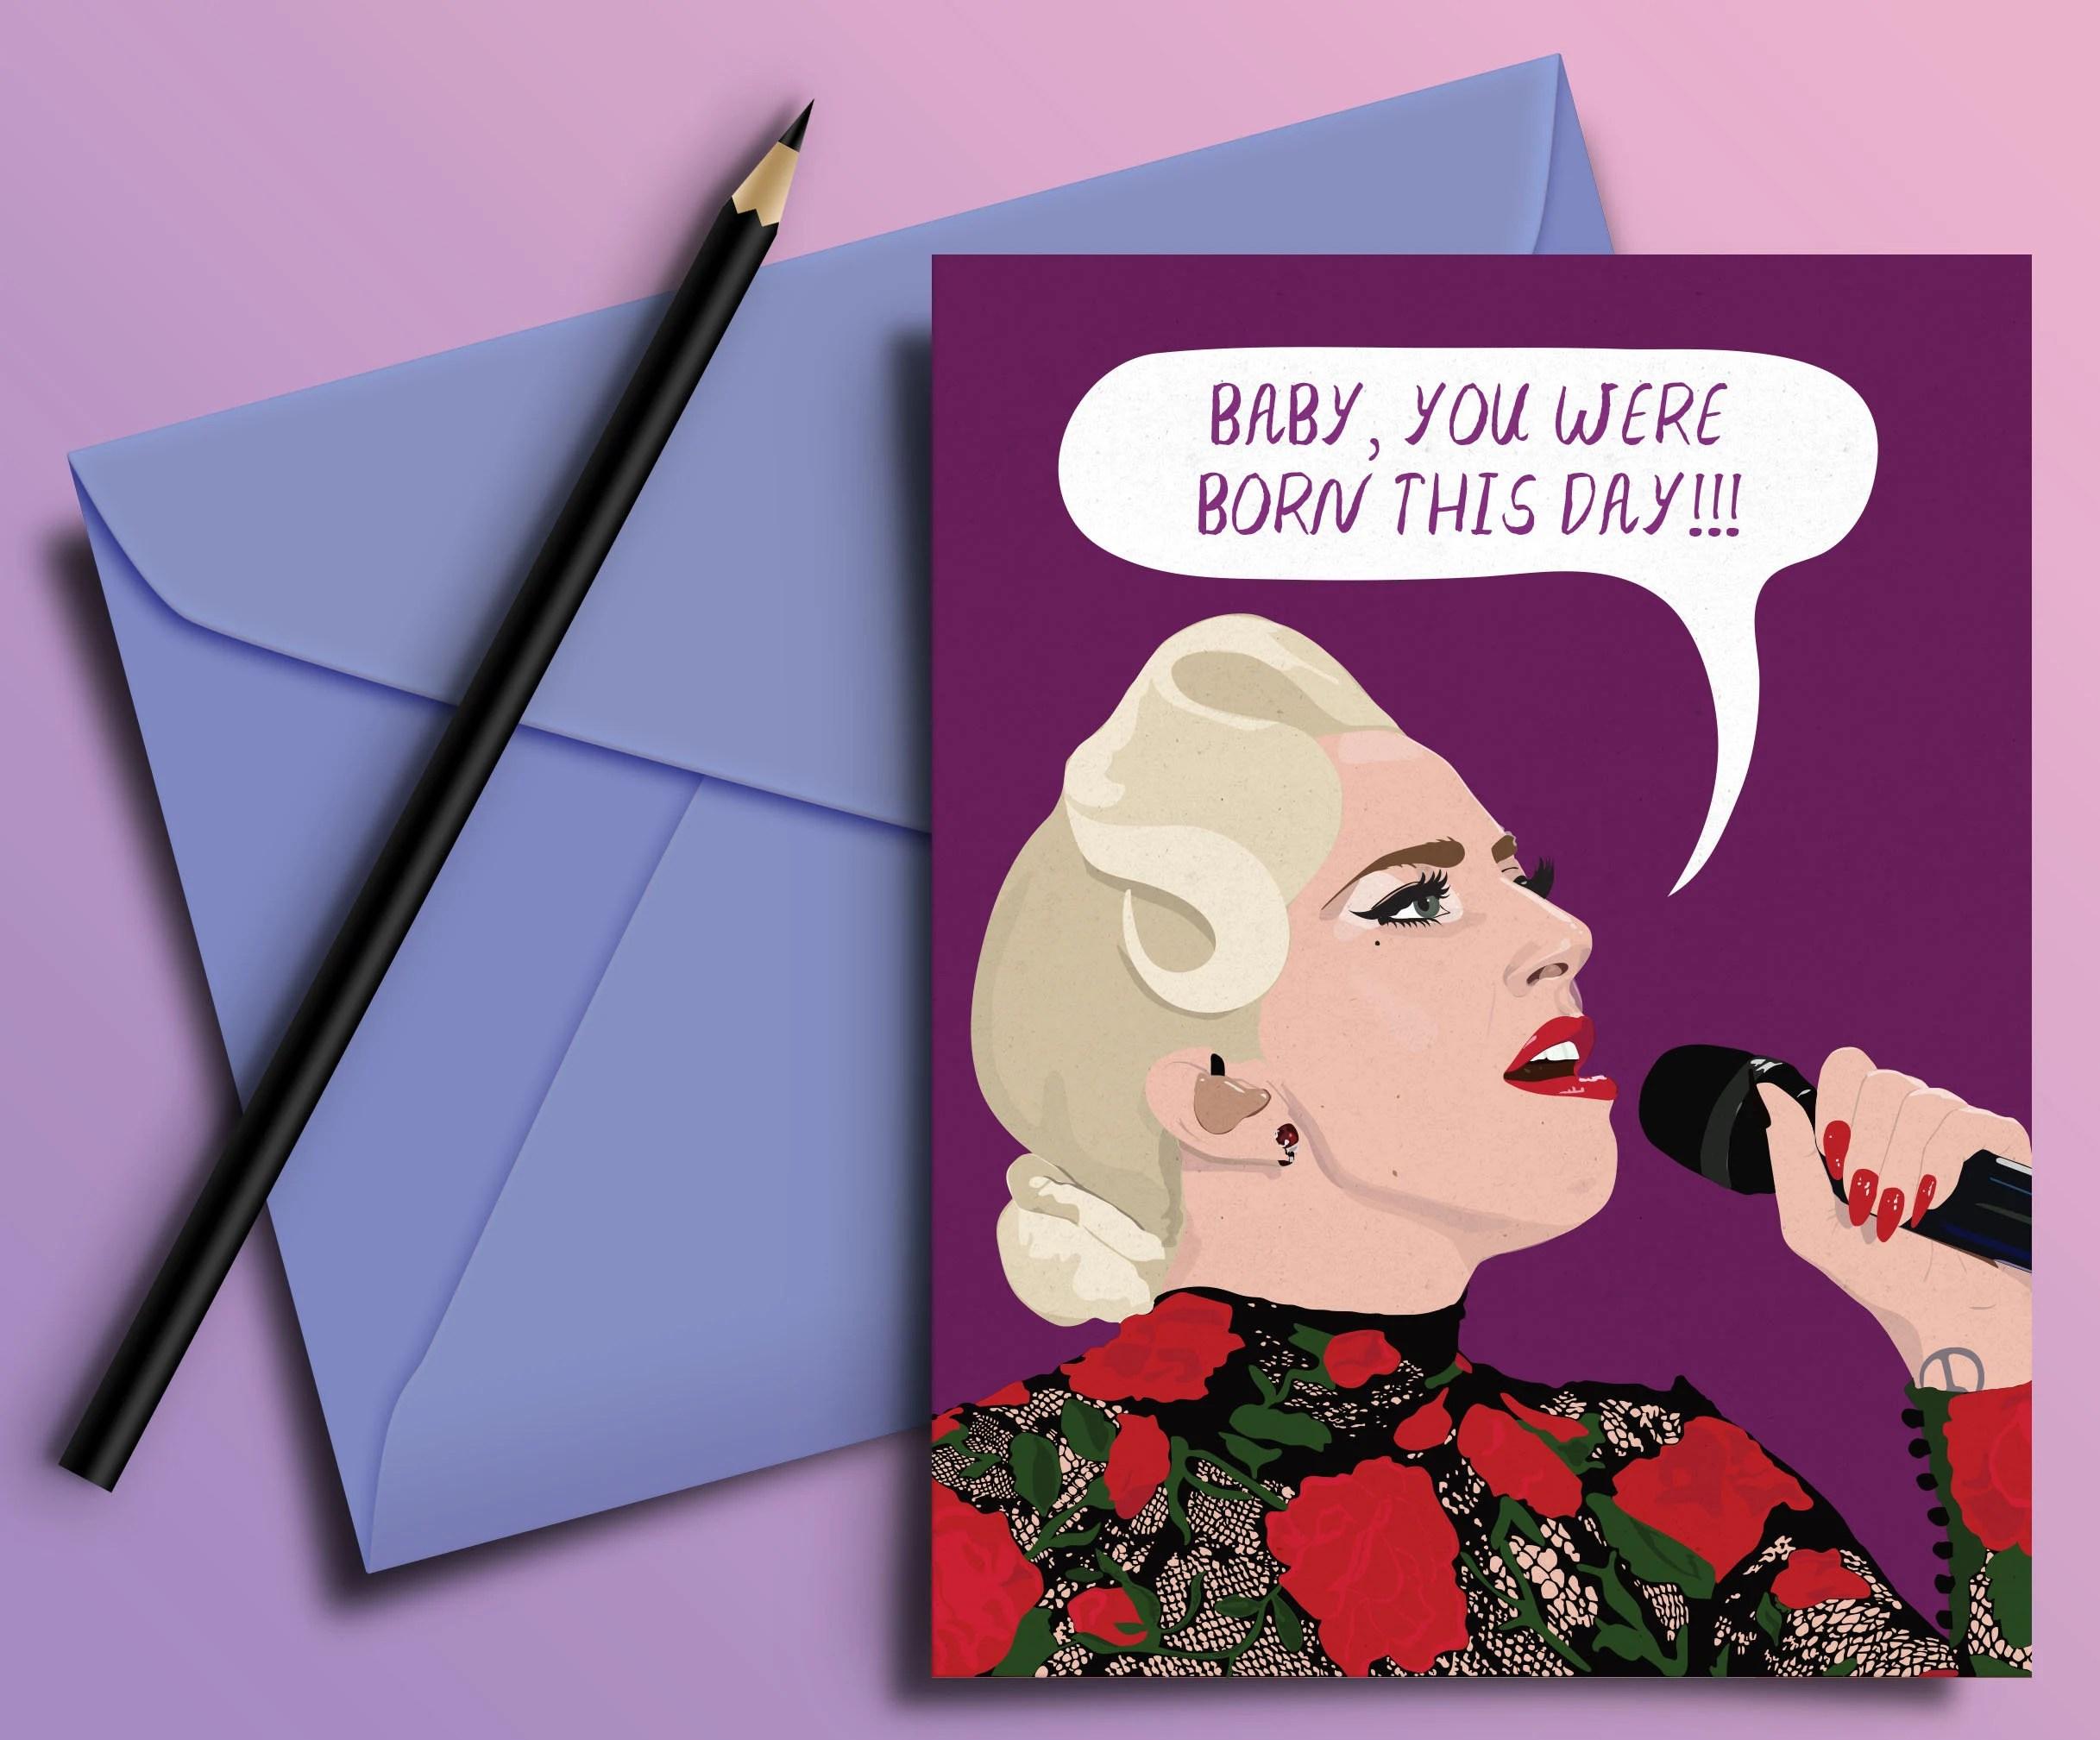 Lady Gaga Born This Day Birthday Card Greeting Best Friend Love Lgbtq Pal Gay Pride Girlfriend